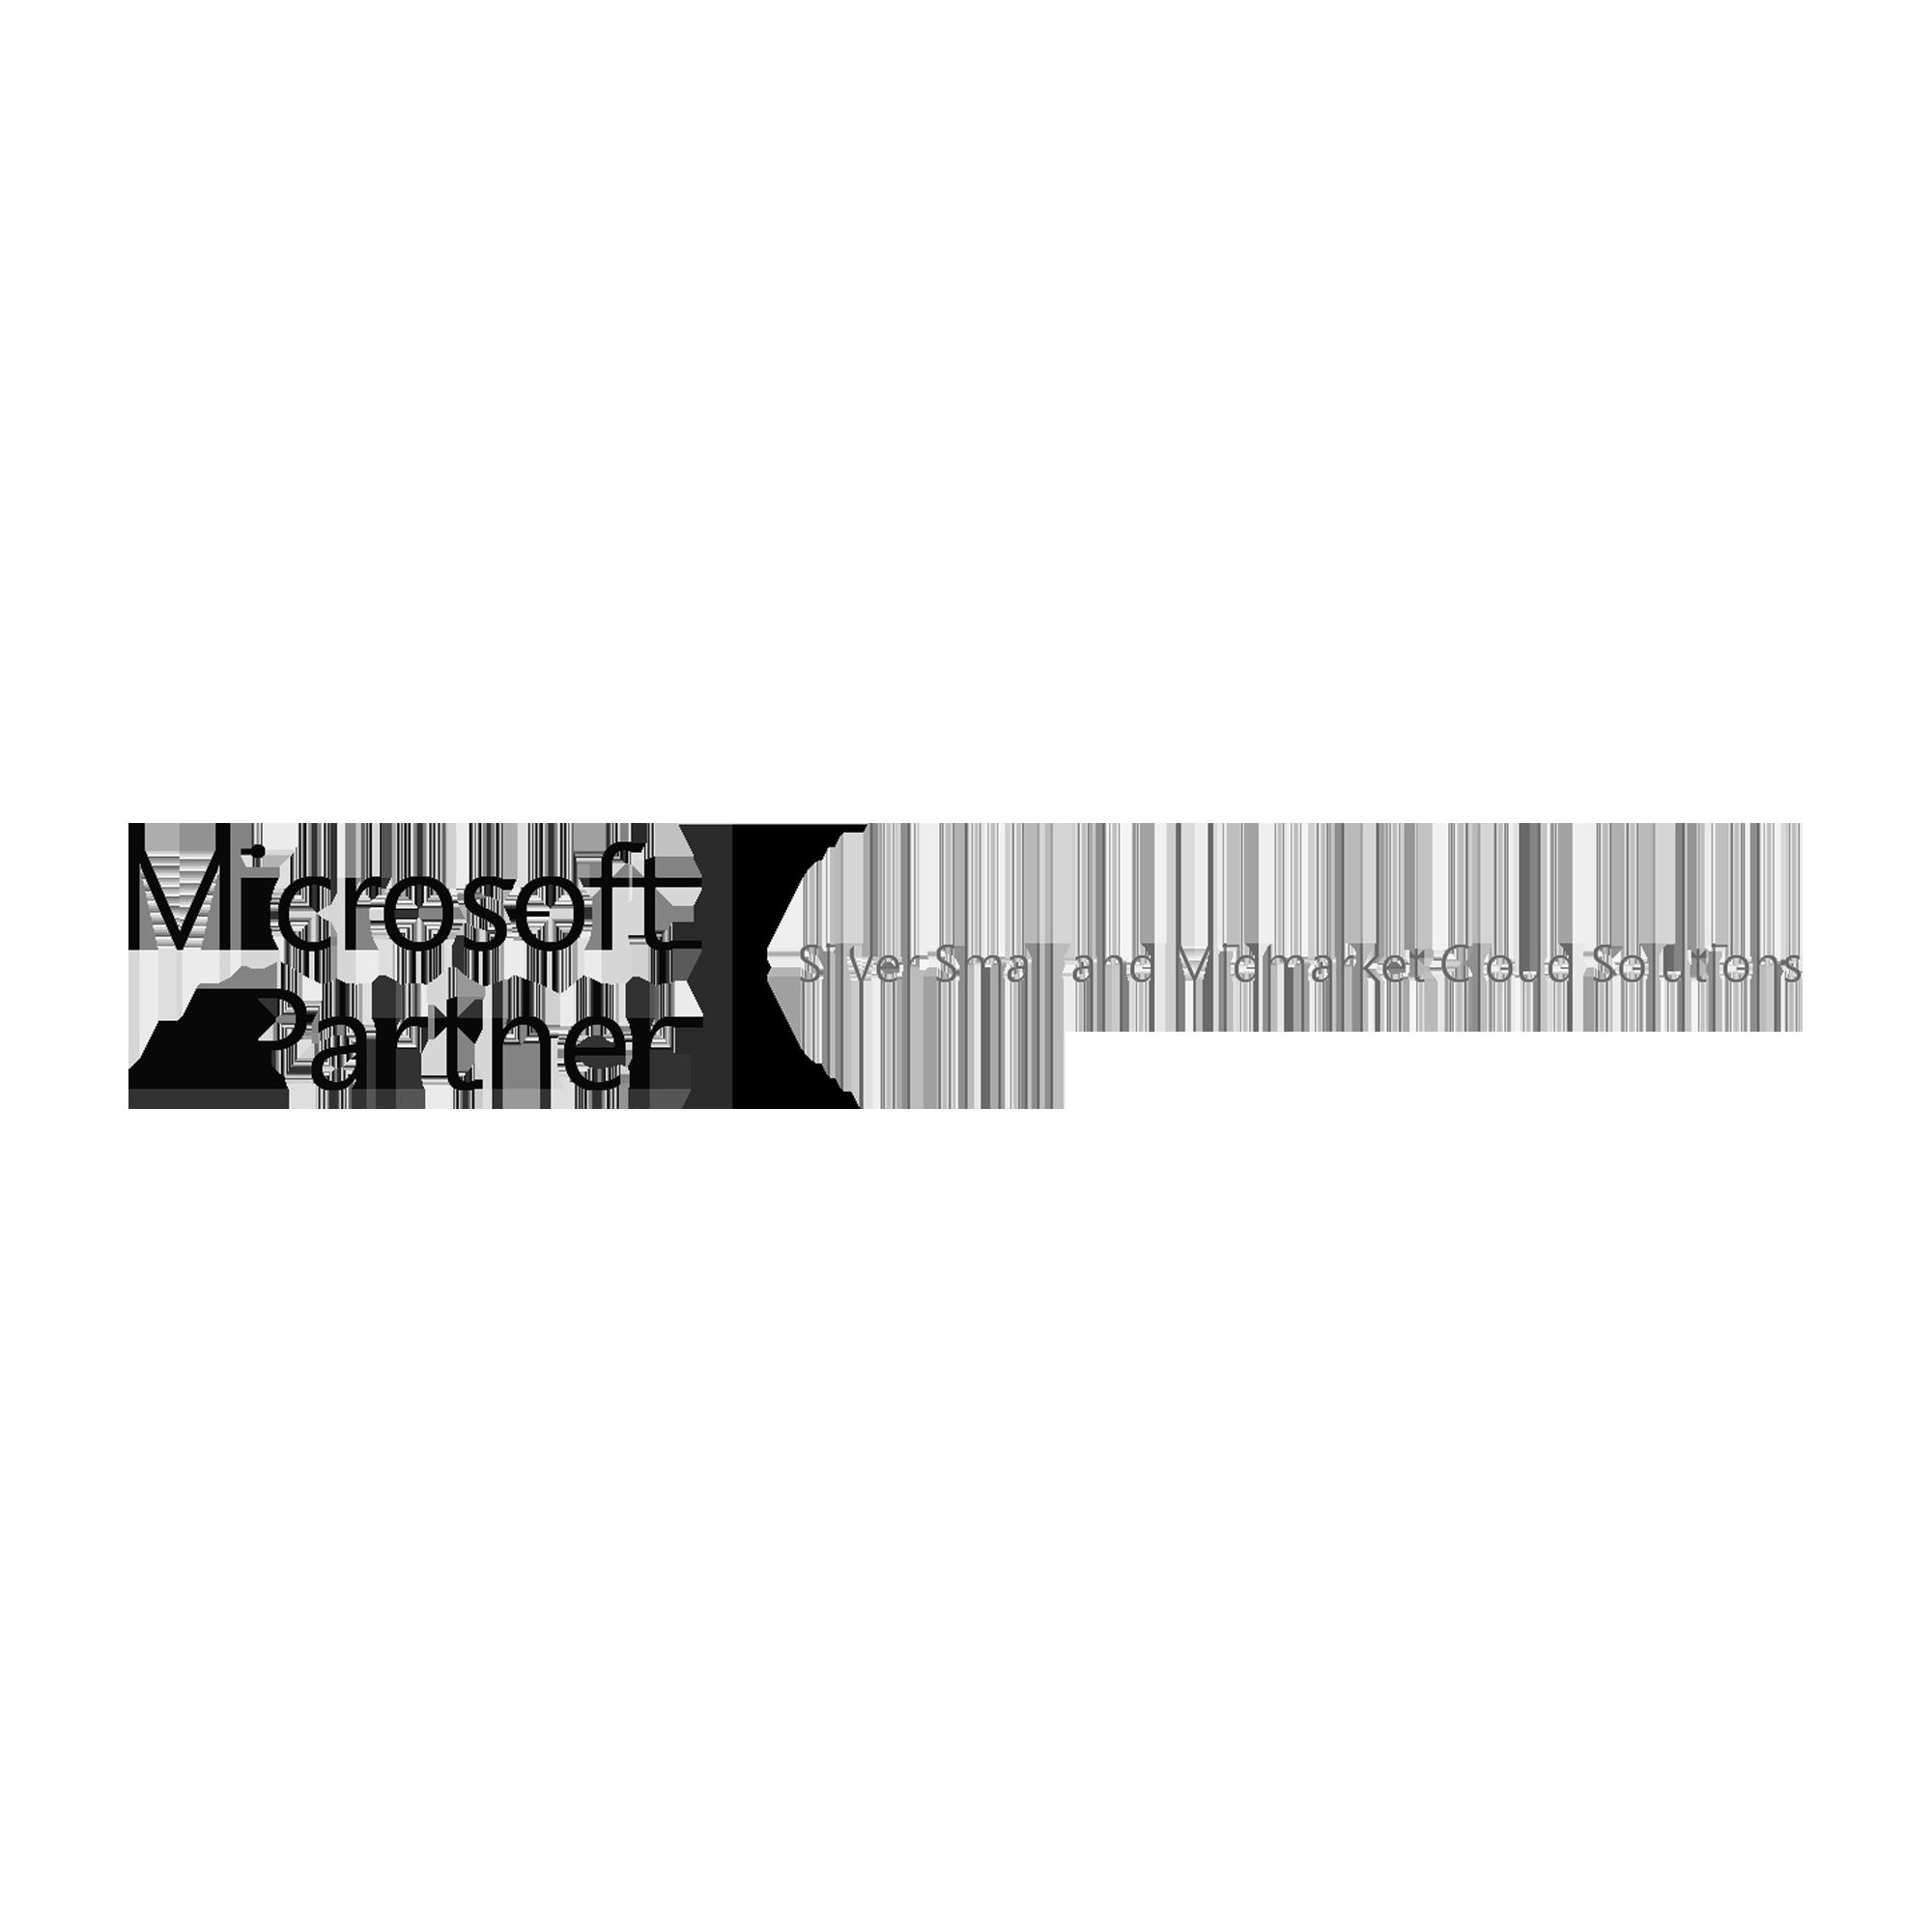 1. Microsoft Partnership